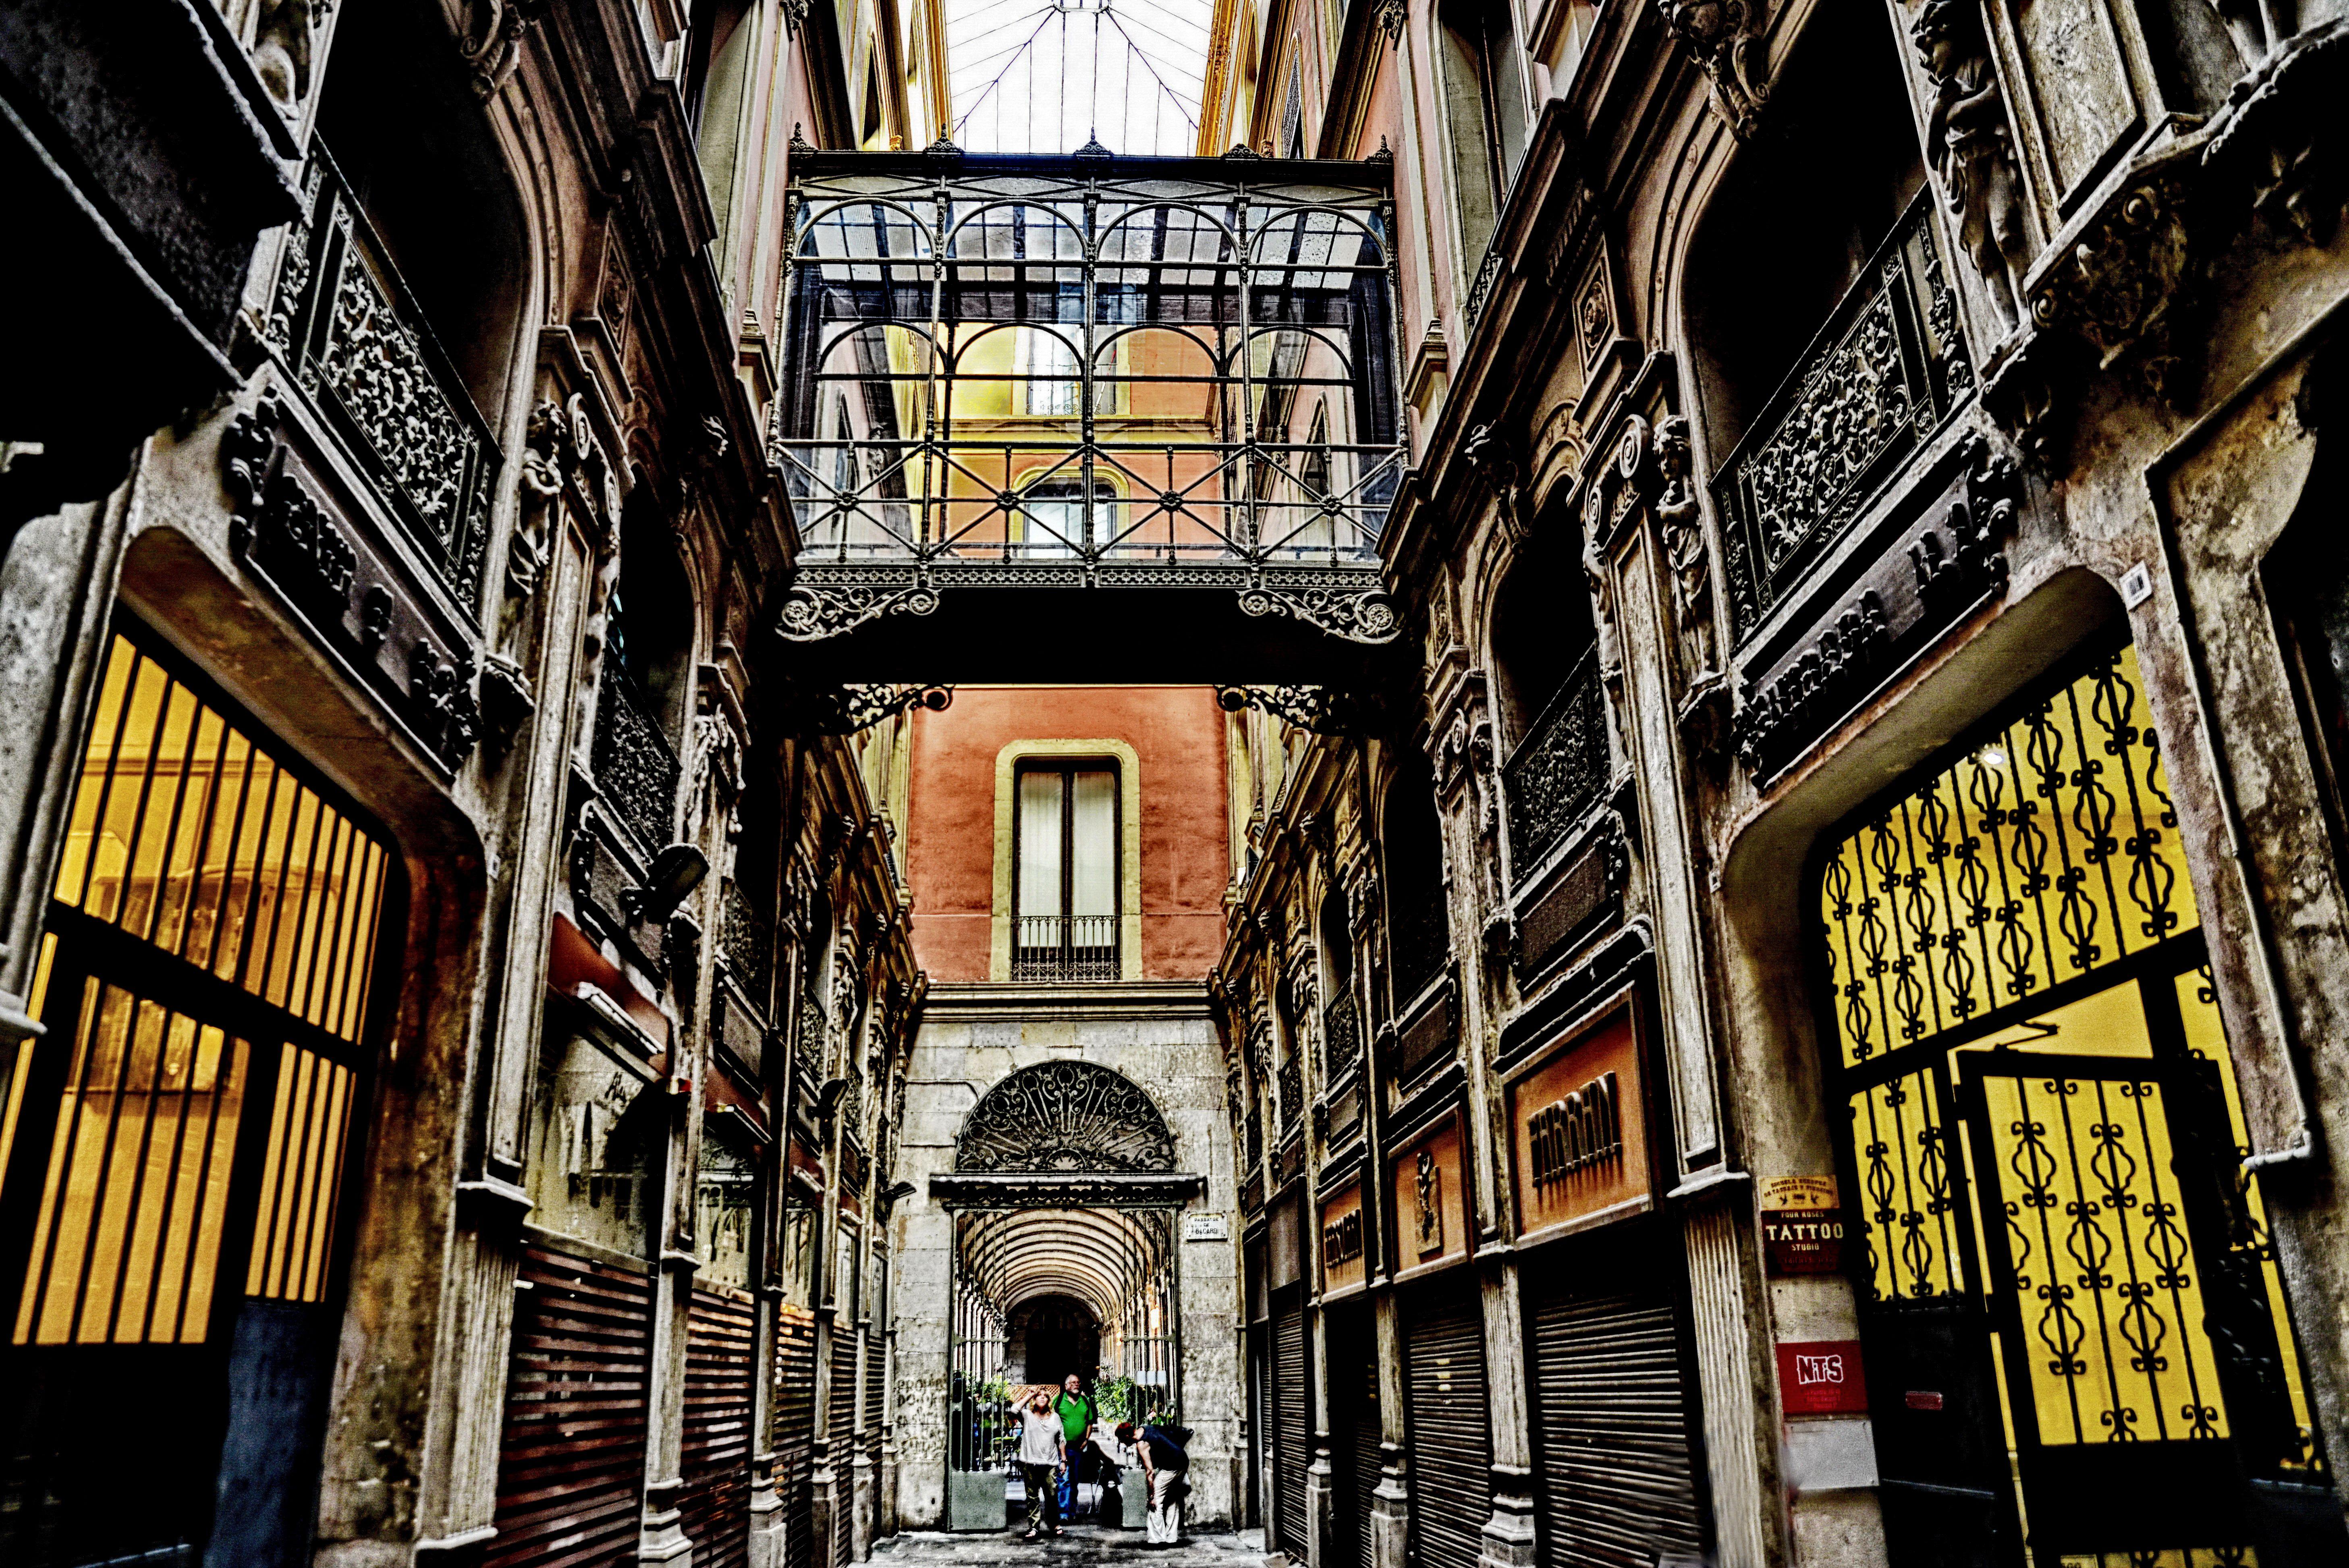 Inner corridor between two buildings in Barcelona Spain